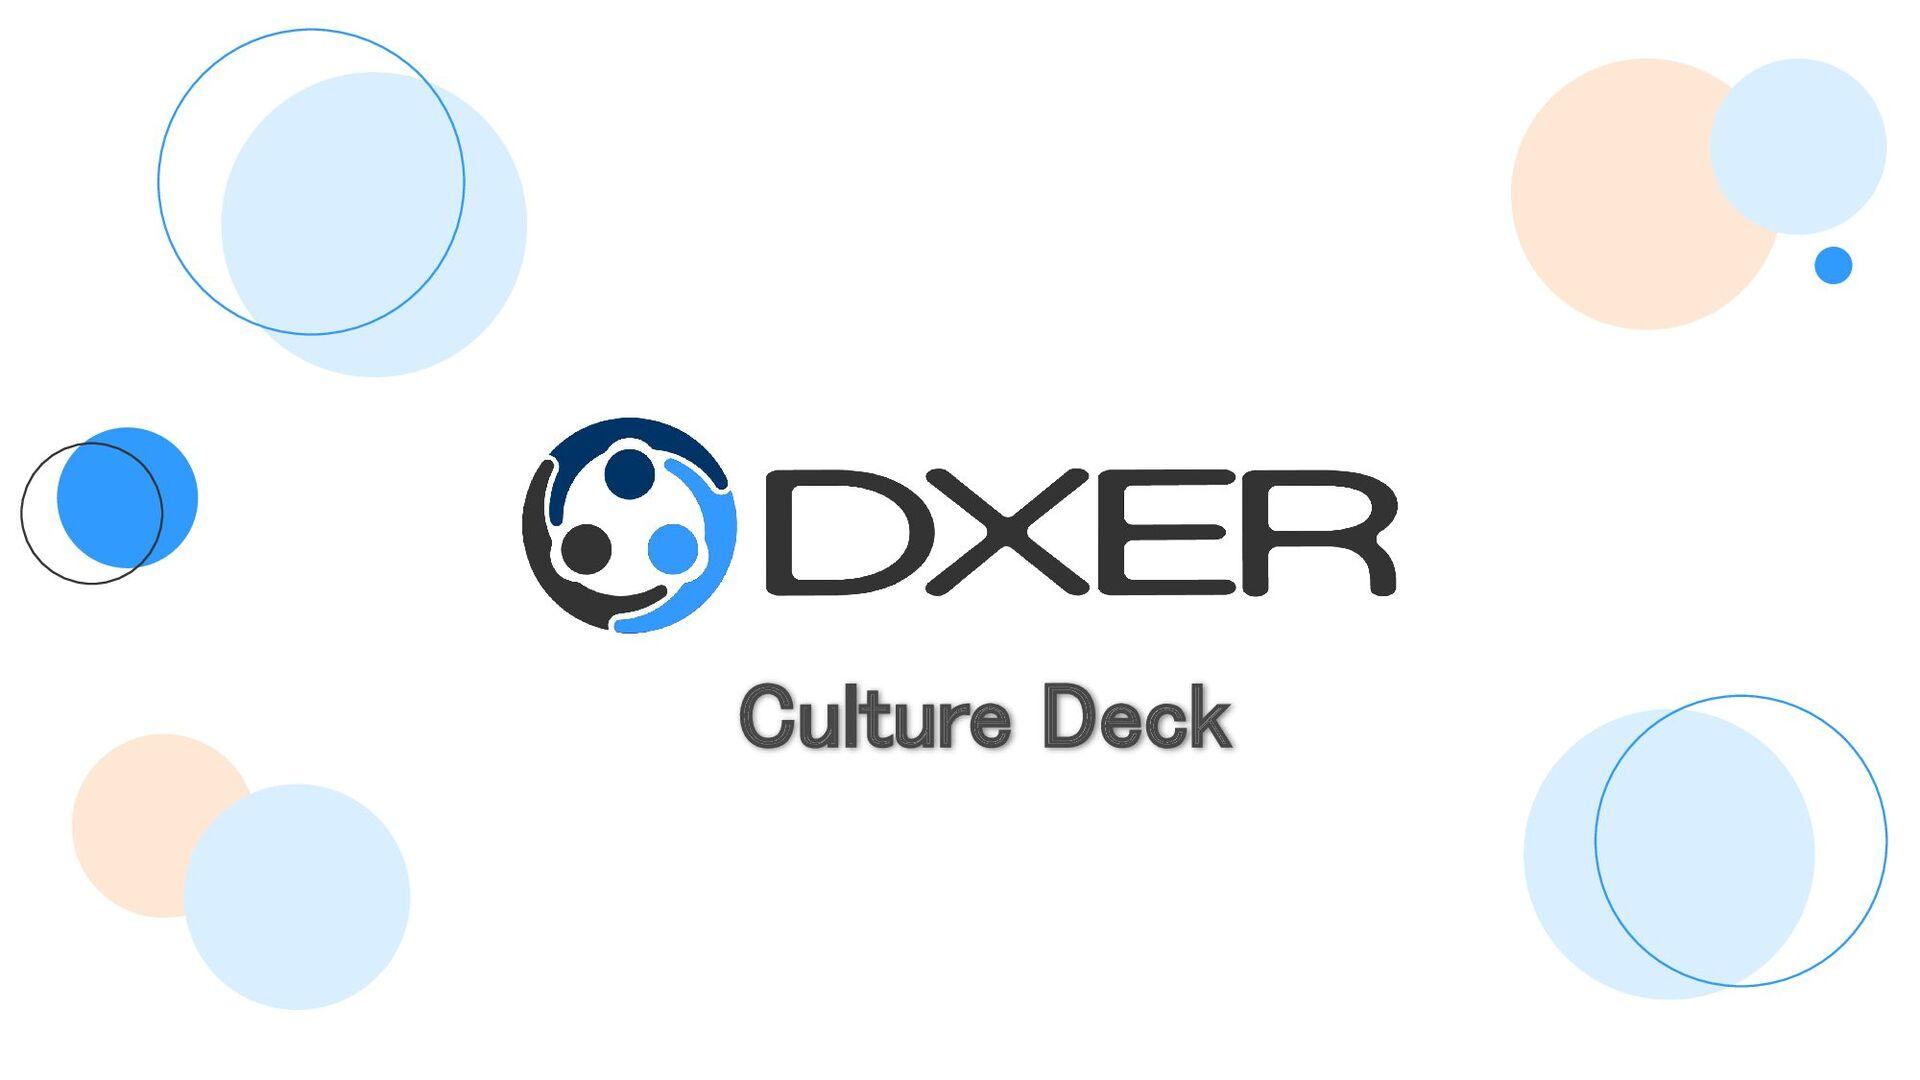 Culture Deck